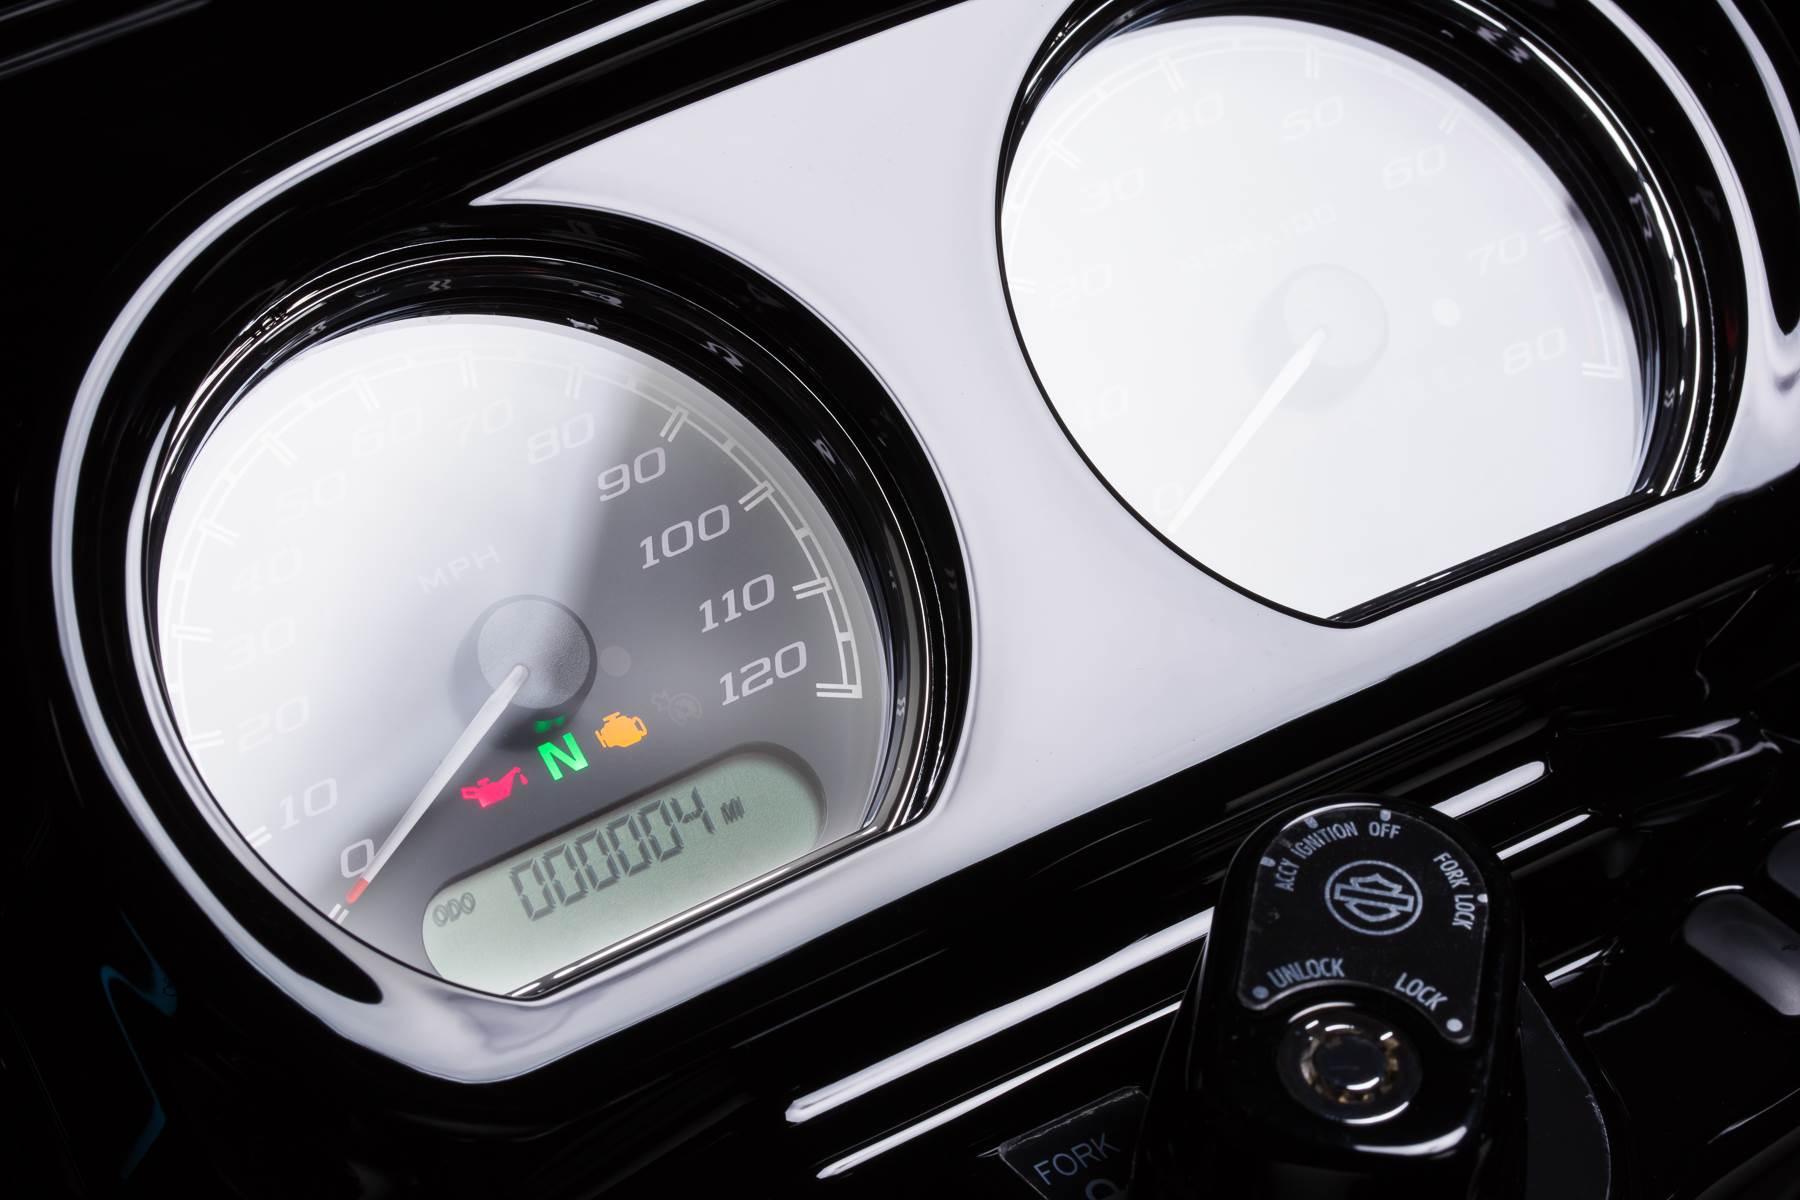 2018 Harley-Davidson Road Glide Special 6